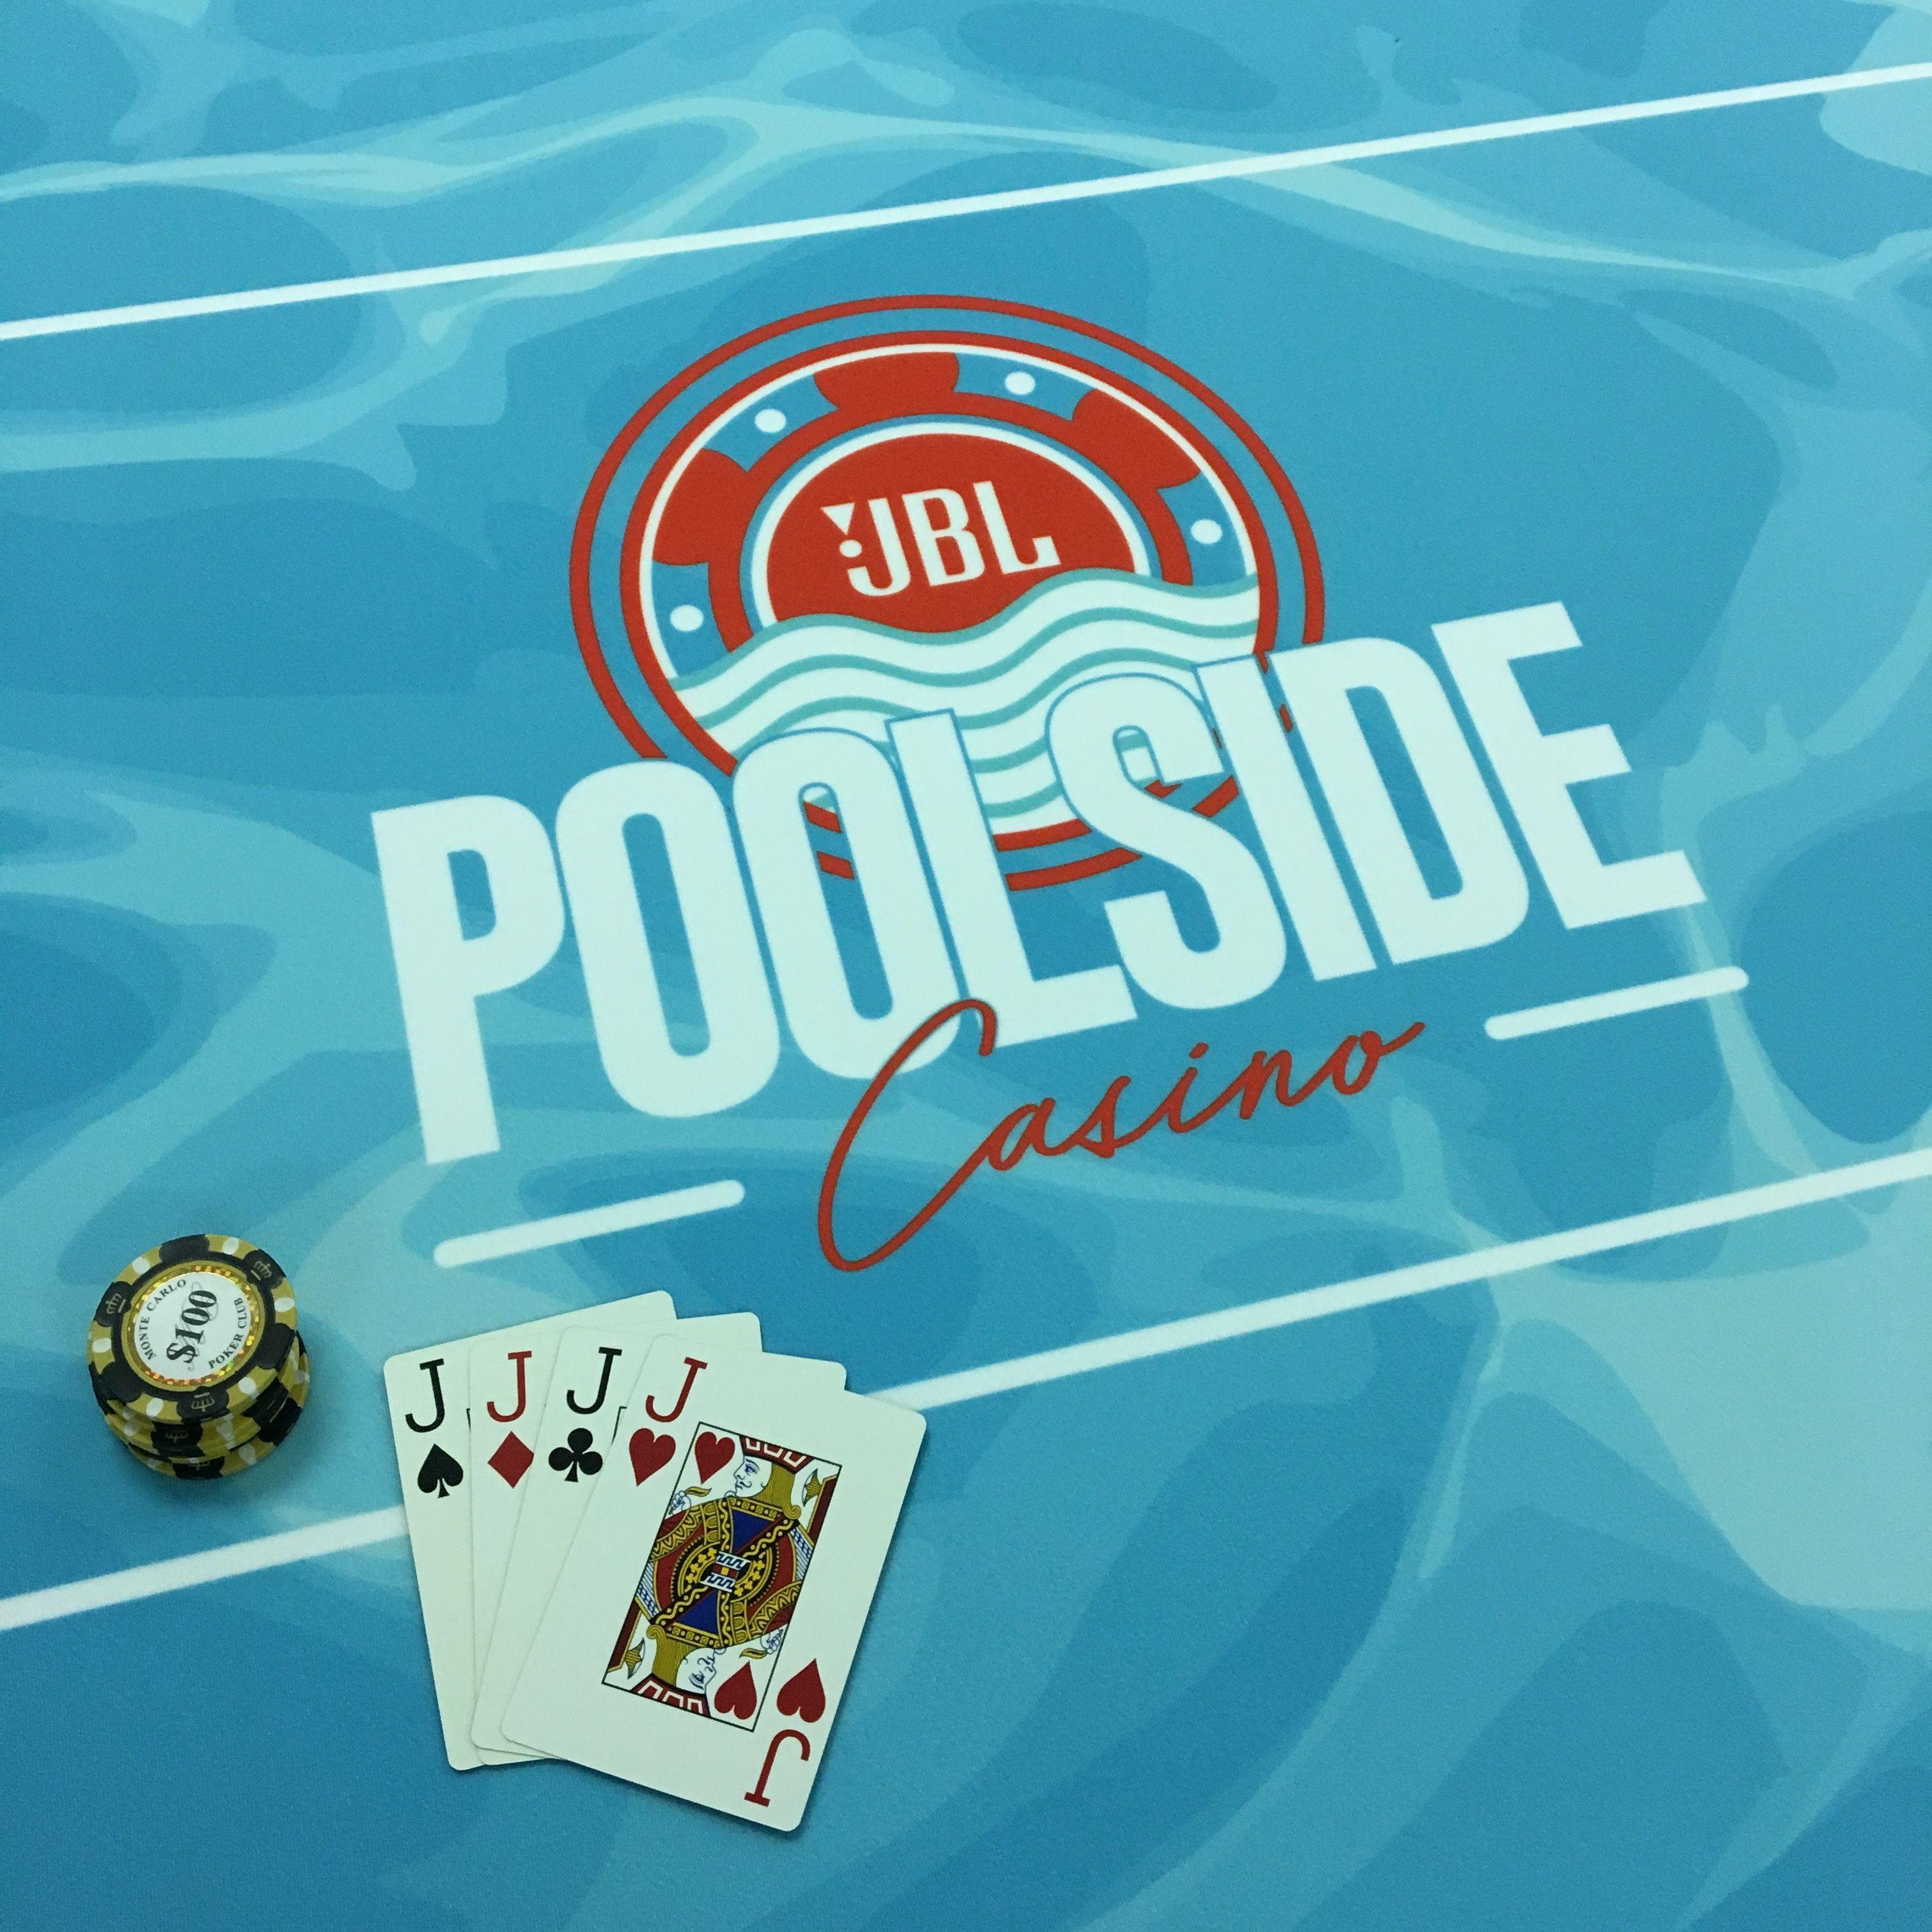 Best casino close to nyc